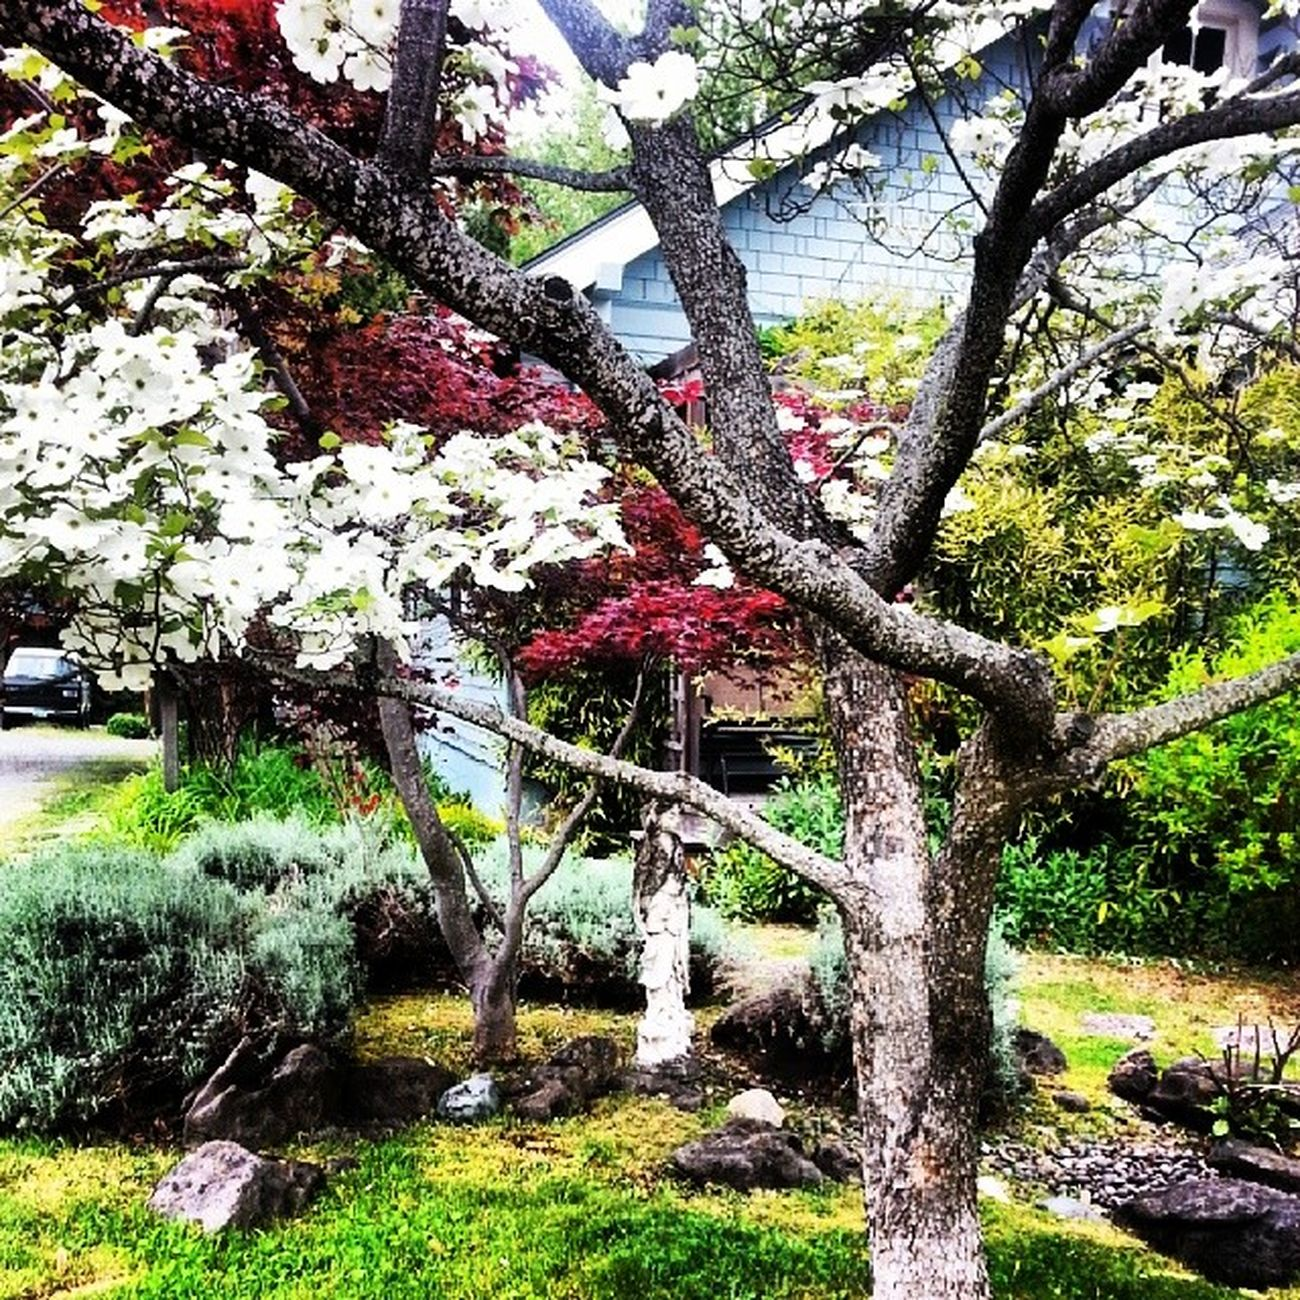 Nature NaturalBeauty Ashland Southernoregon Oregon Trees Flowers Colorful Noisy Vivid